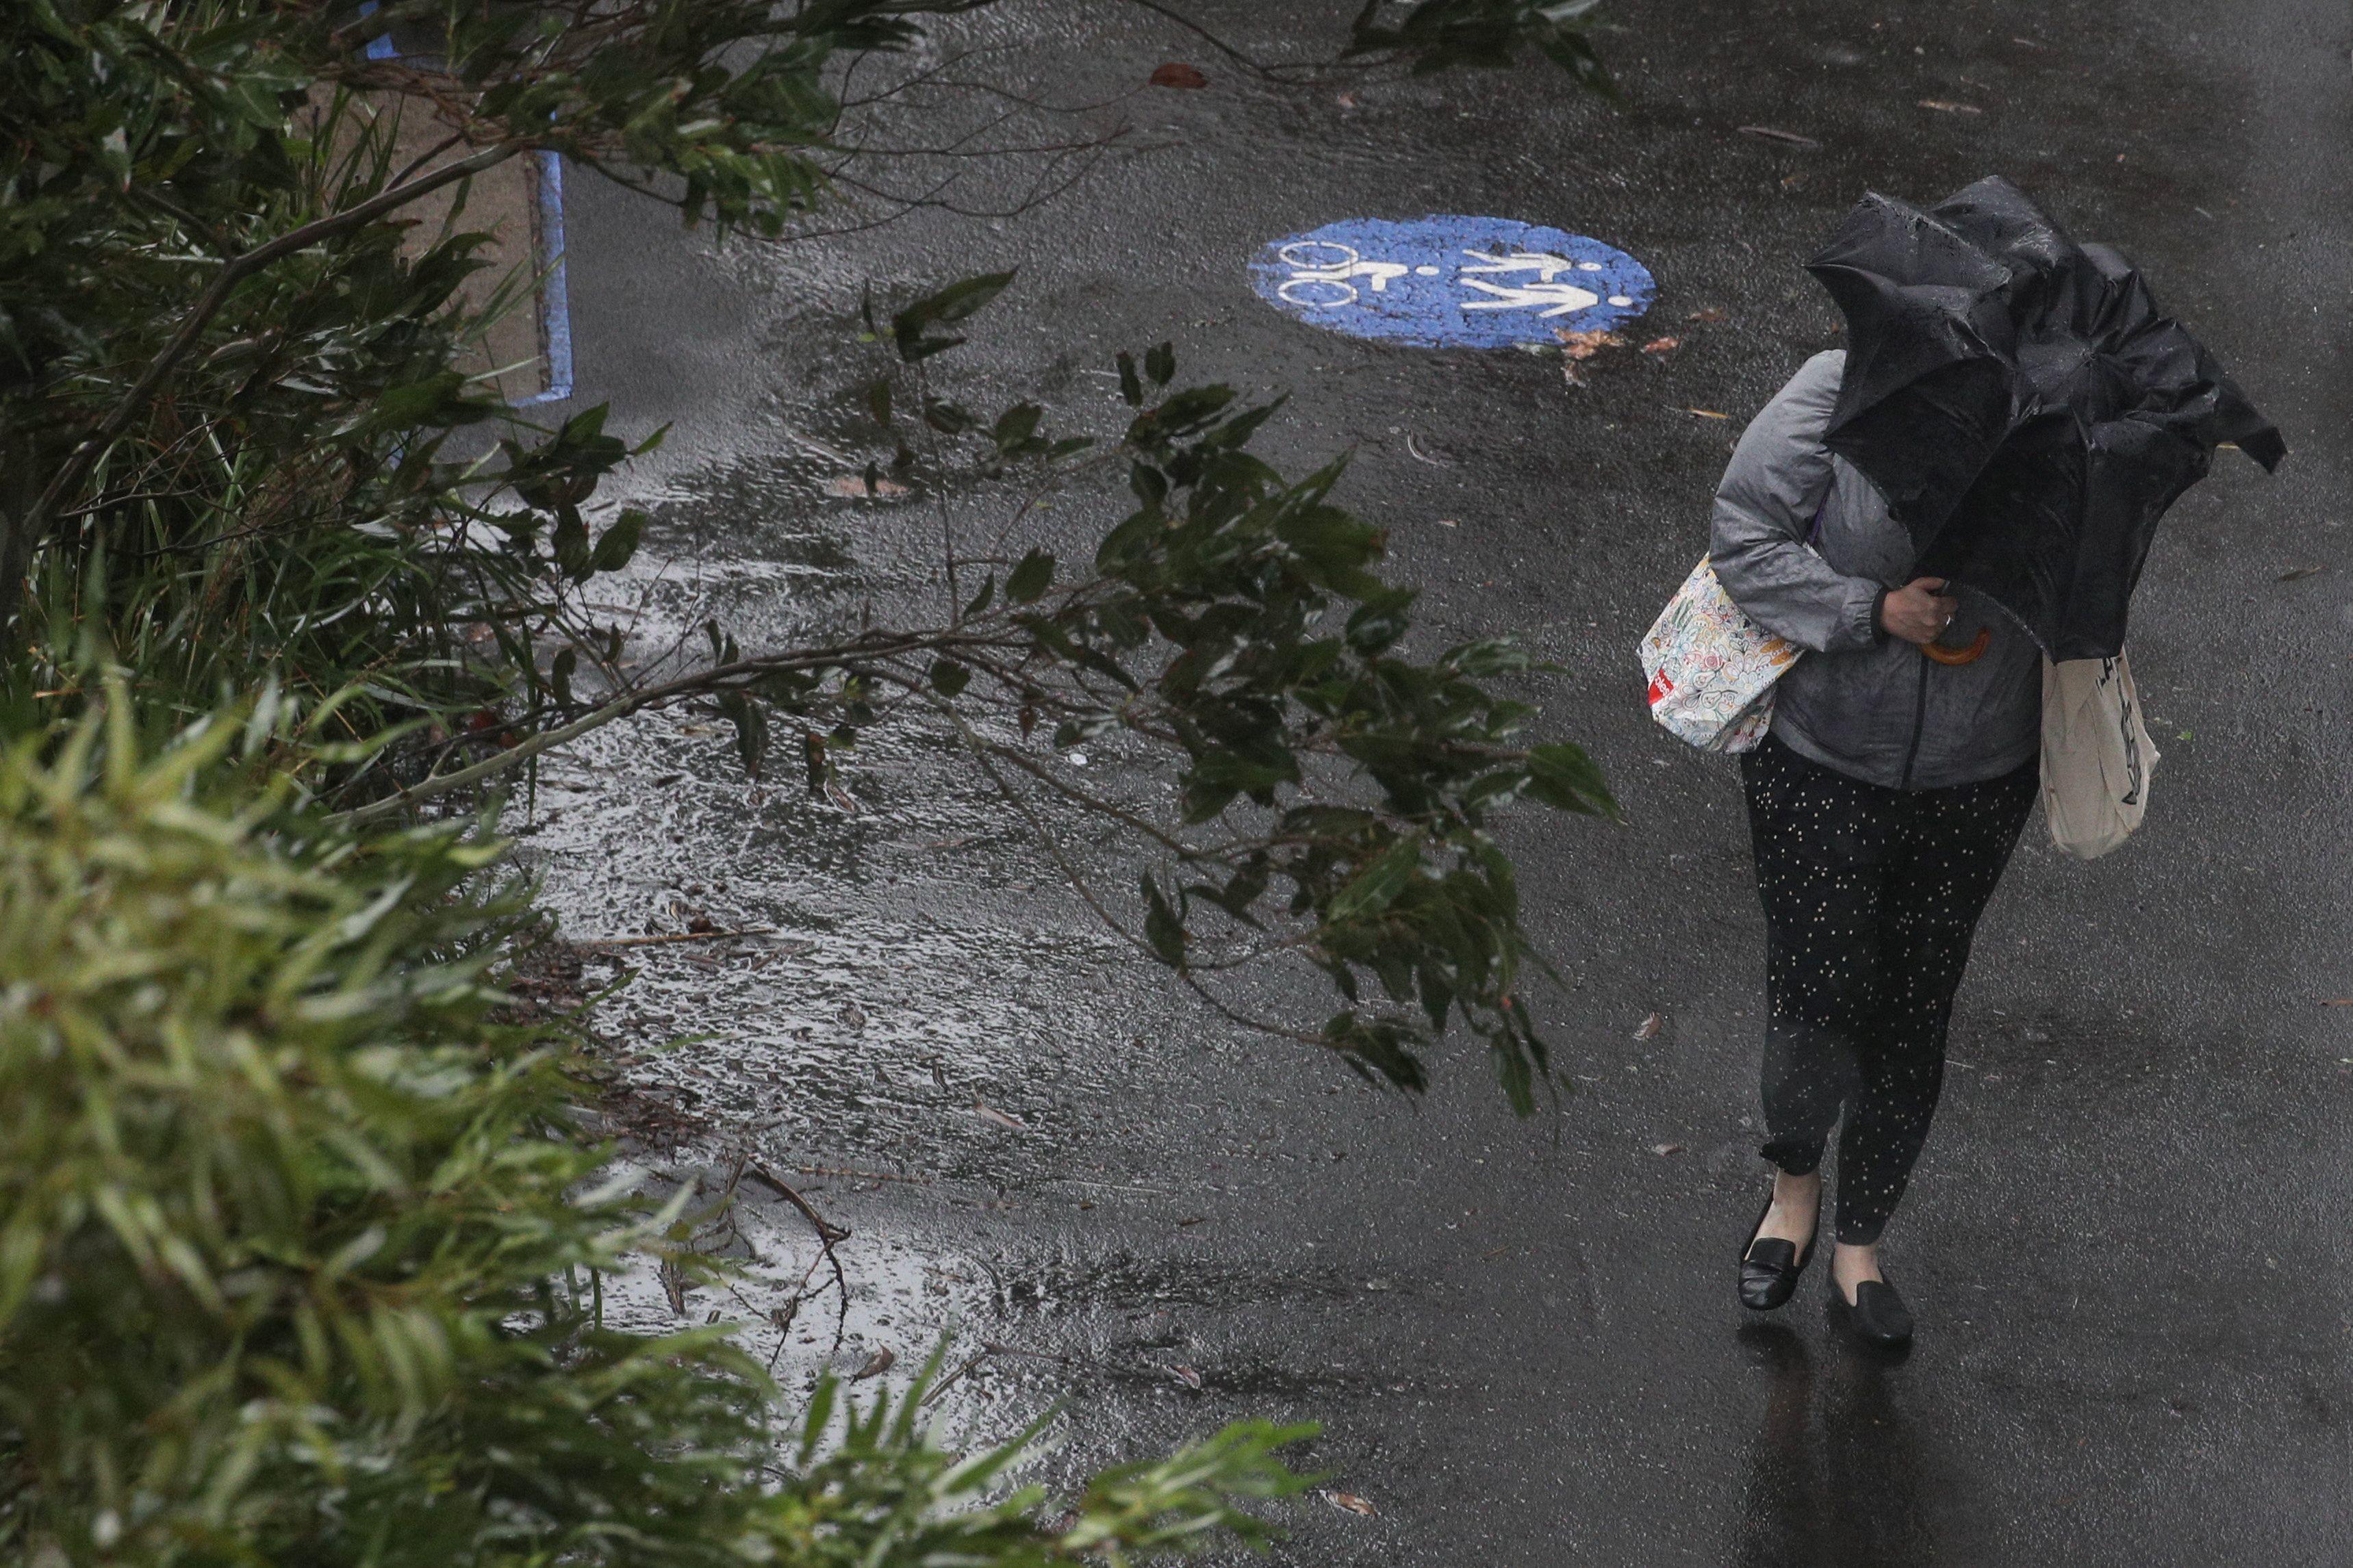 A pedestrian braves strong wind and rain in Sydney, New South Wales, Australia, February 9, 2020.  REUTERS/Loren Elliott - RC2PWE945ZMR